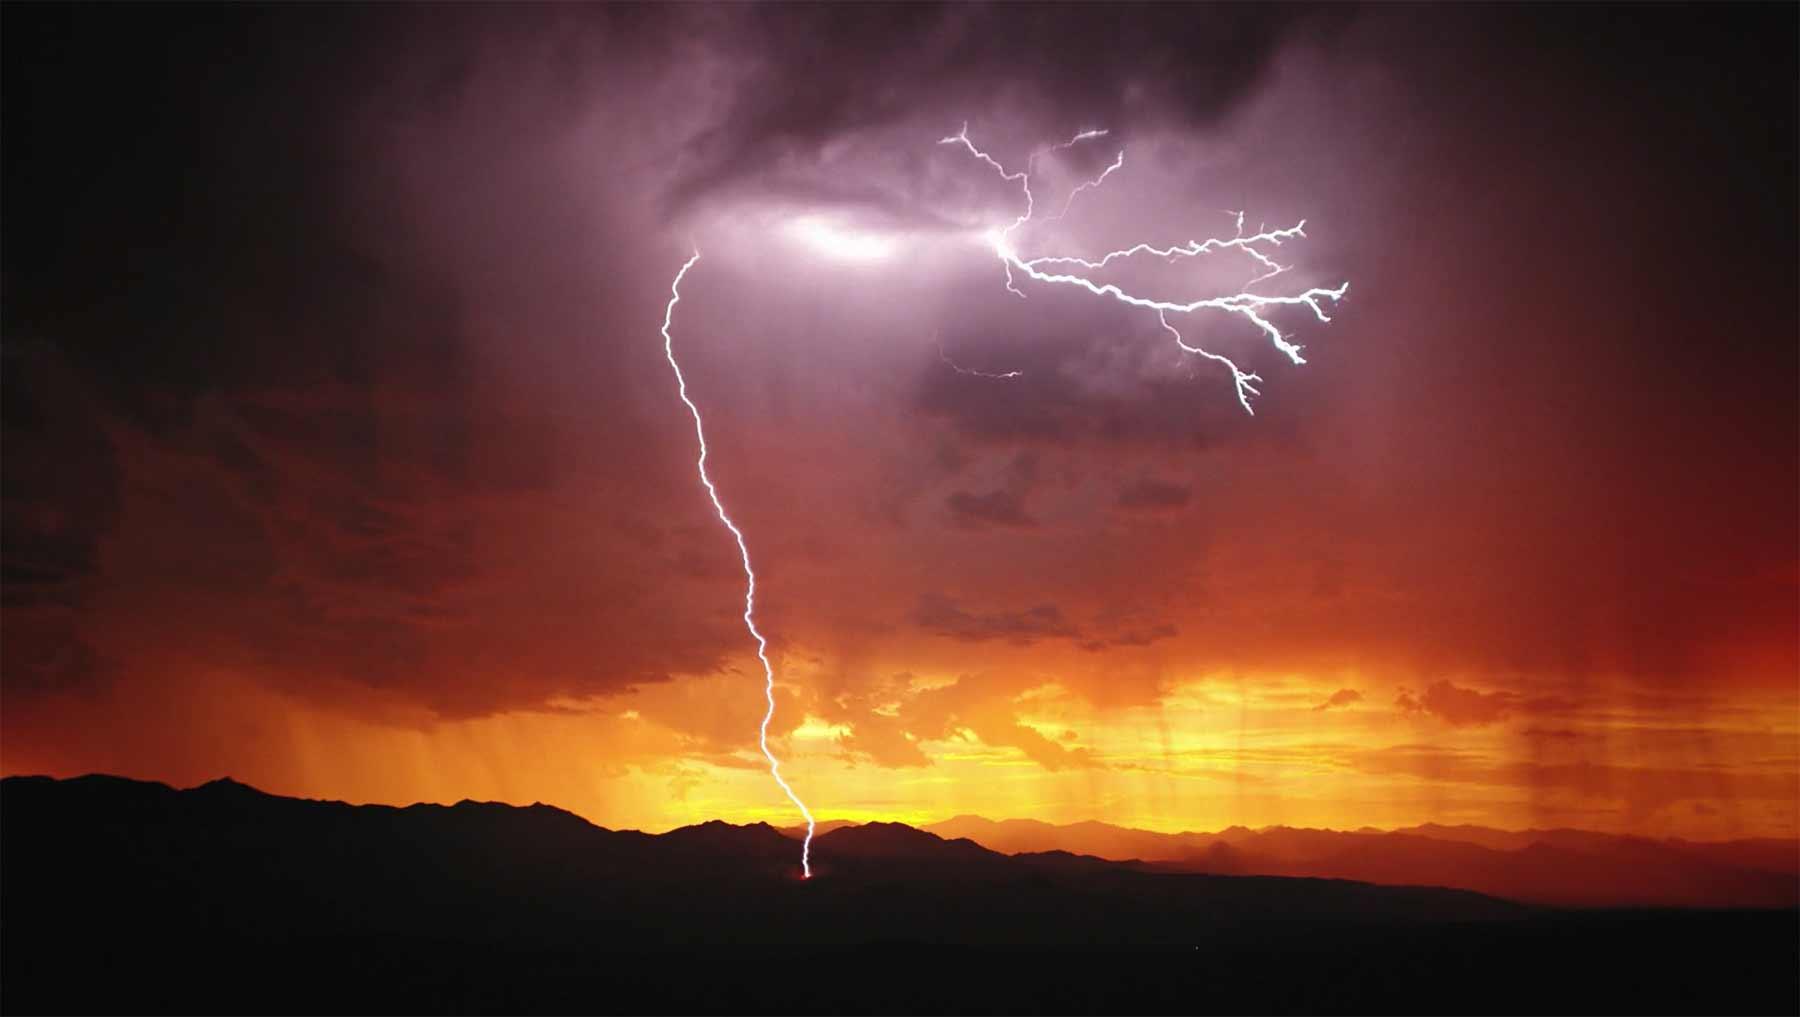 Blitze in Zeitlupe bewundern transient-blitze-in-zeitlupe